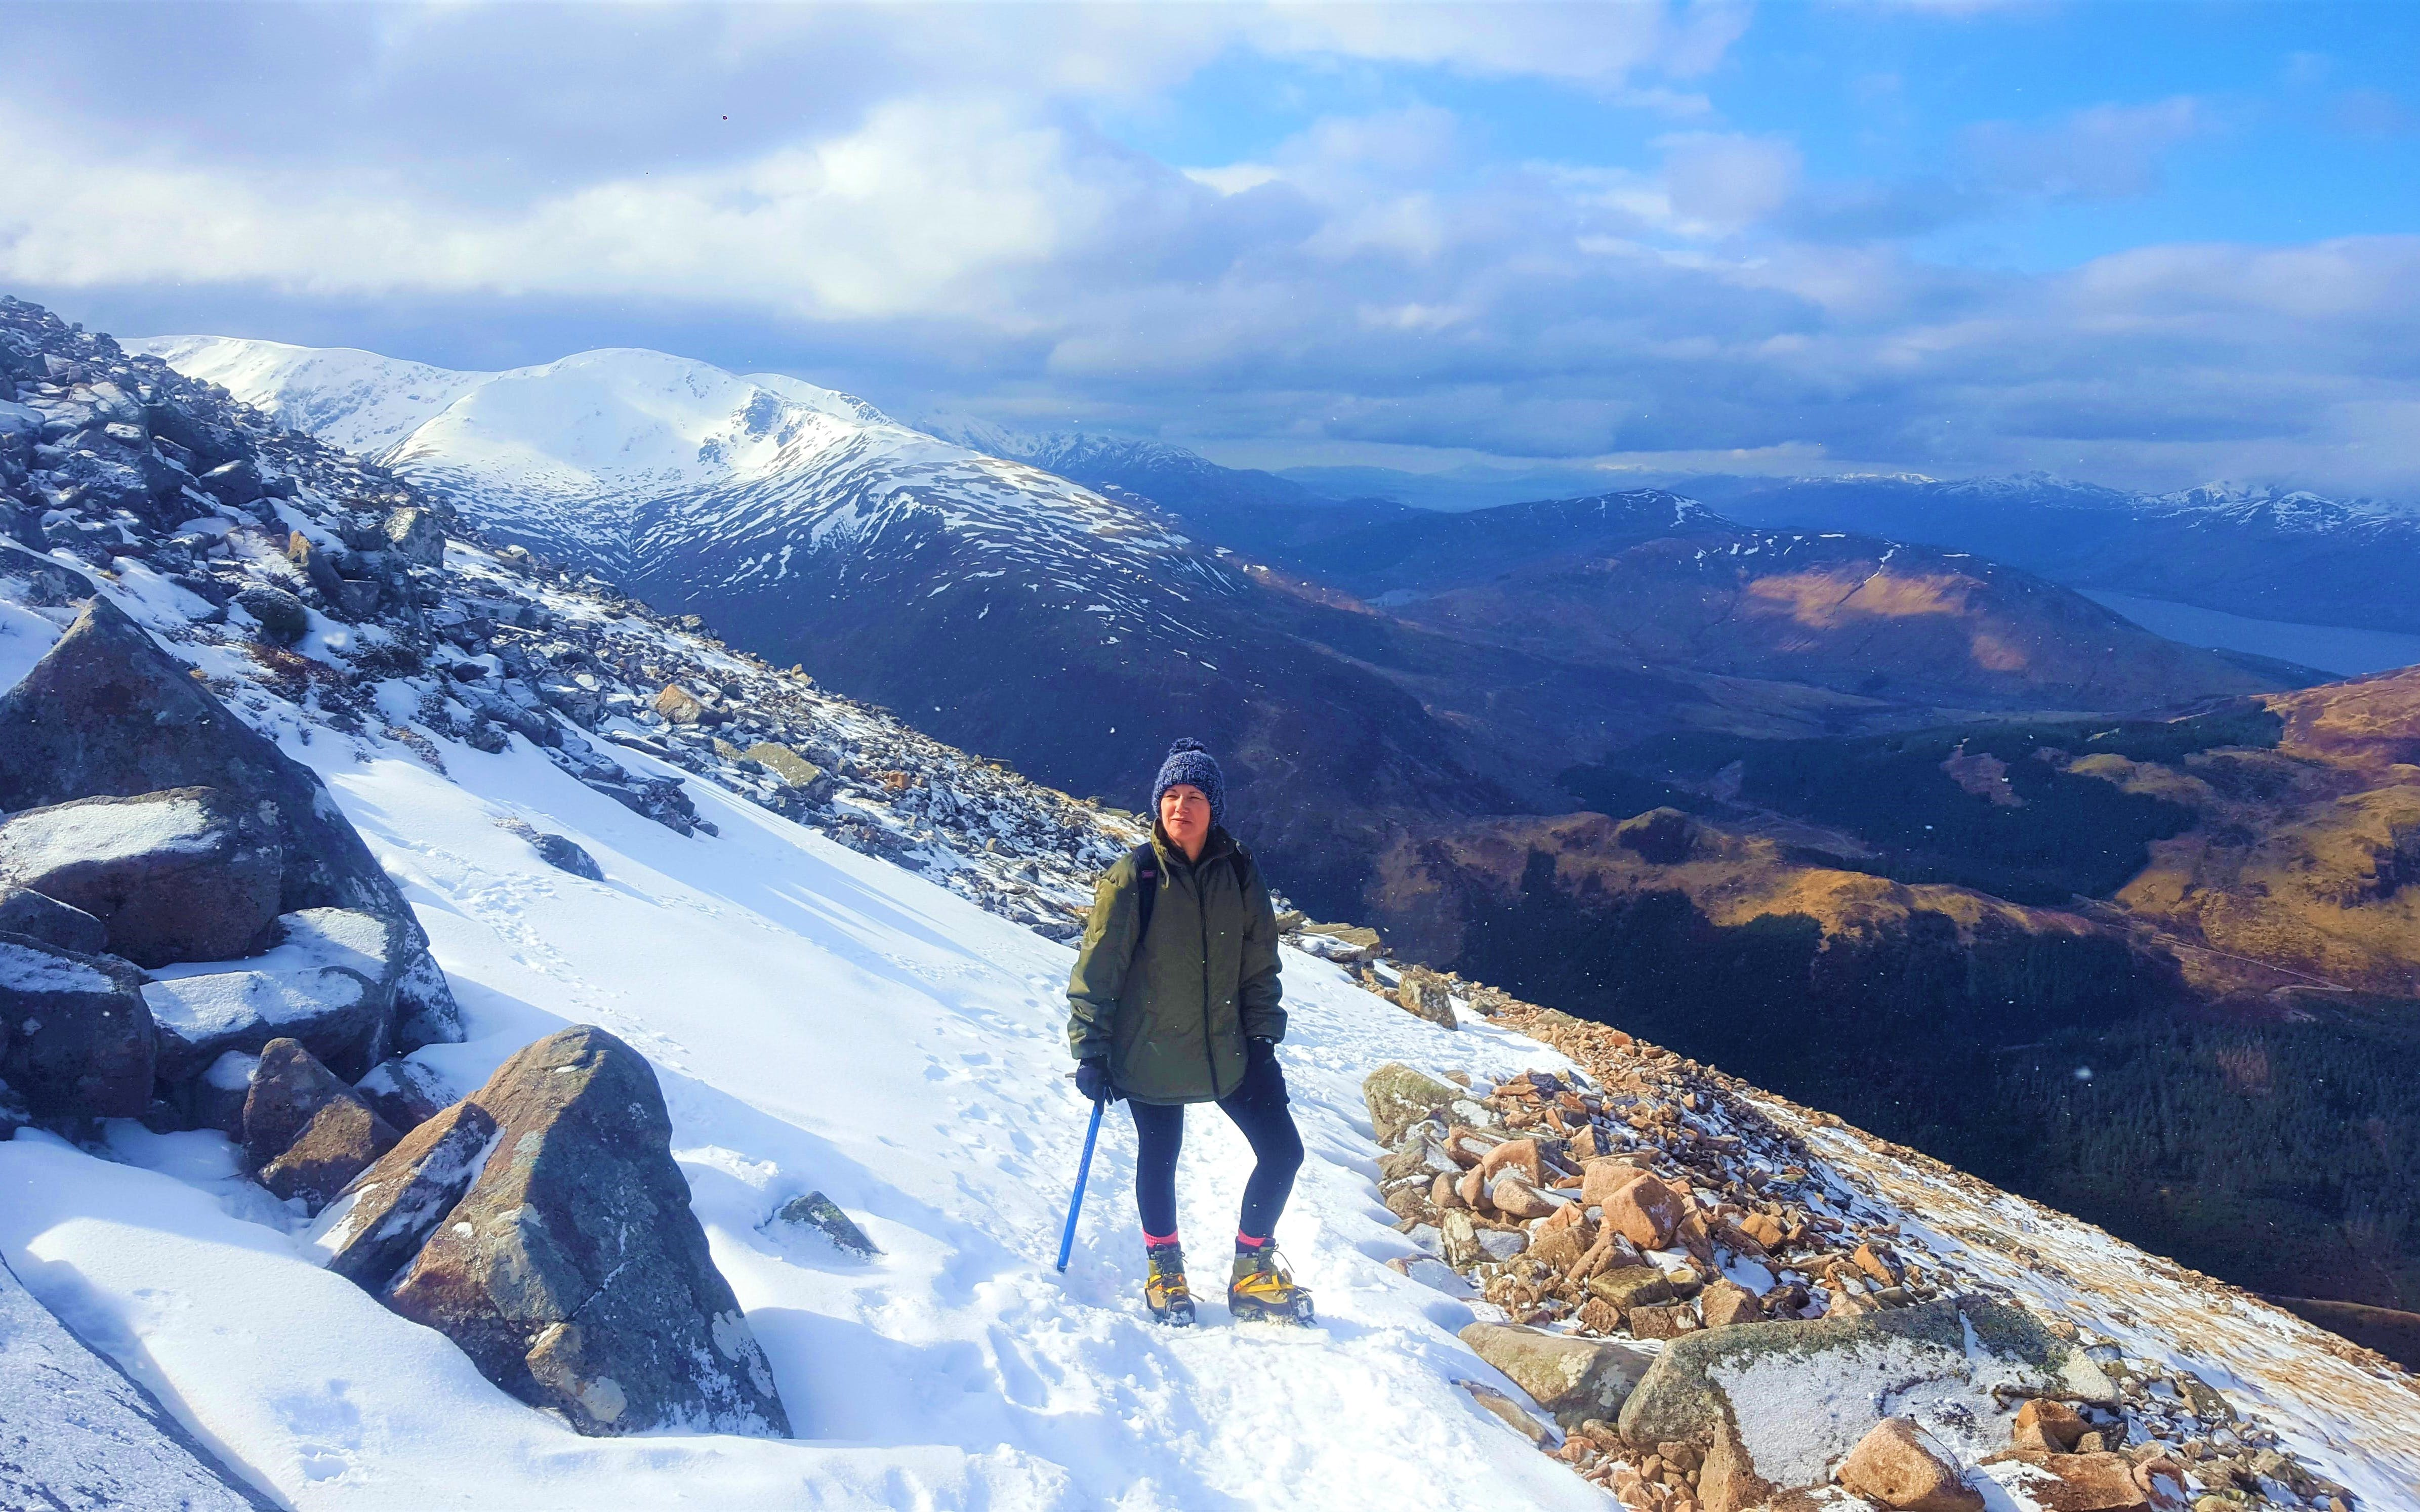 Ben Nevis Winter Ascent (1,345m)